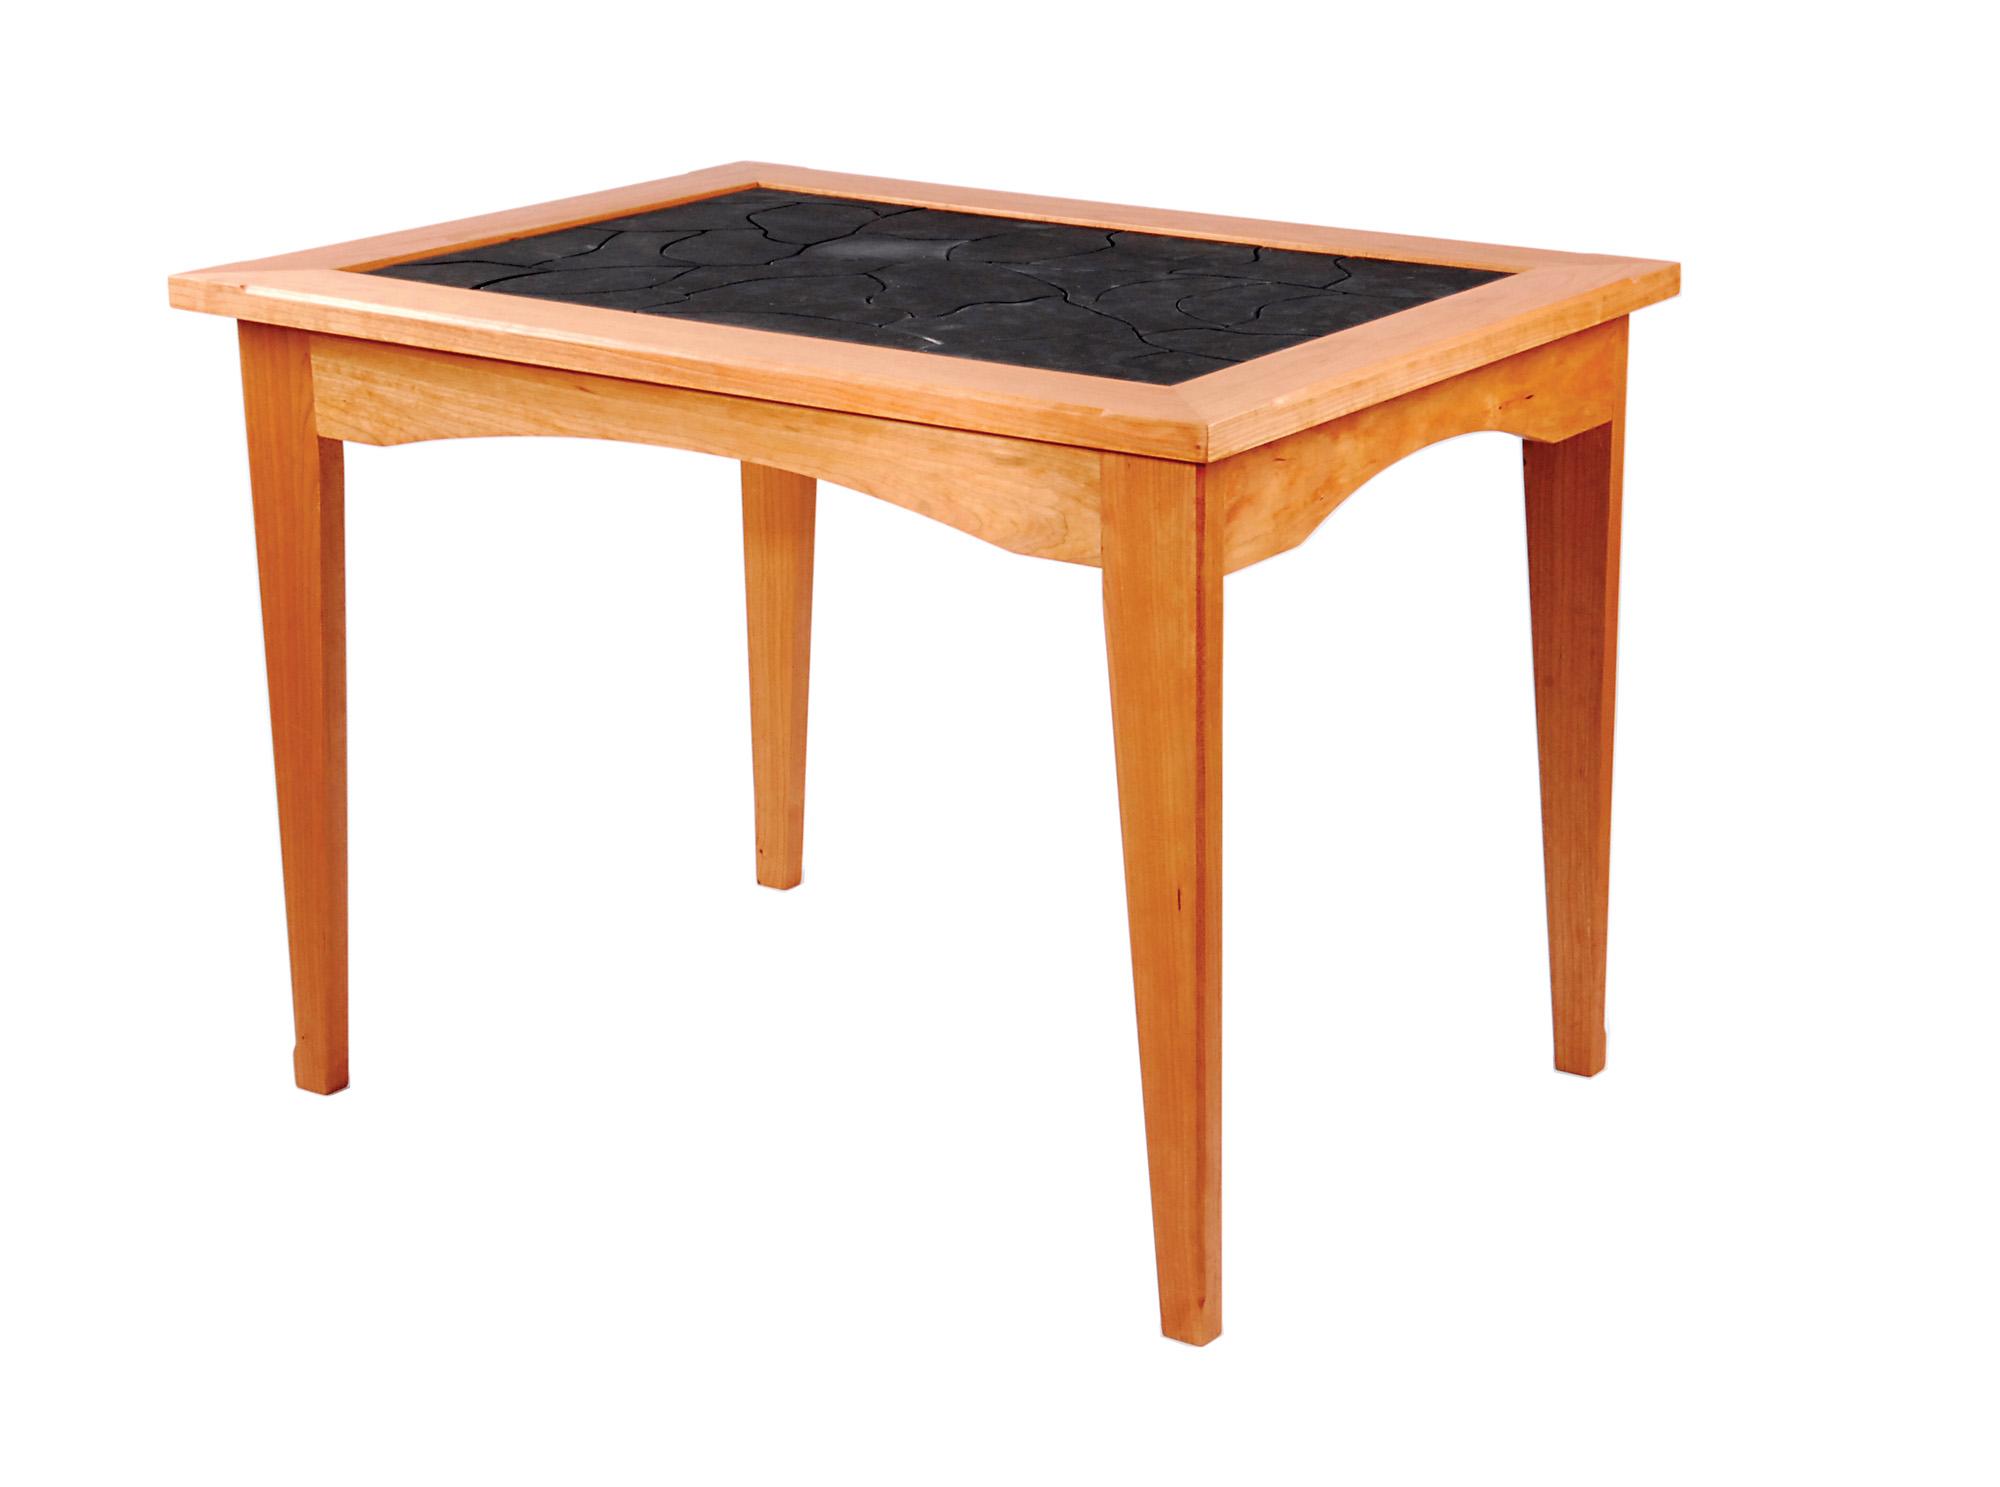 New Jersey >> Furniture - Princeton Product PhotographyPrinceton Product Photography